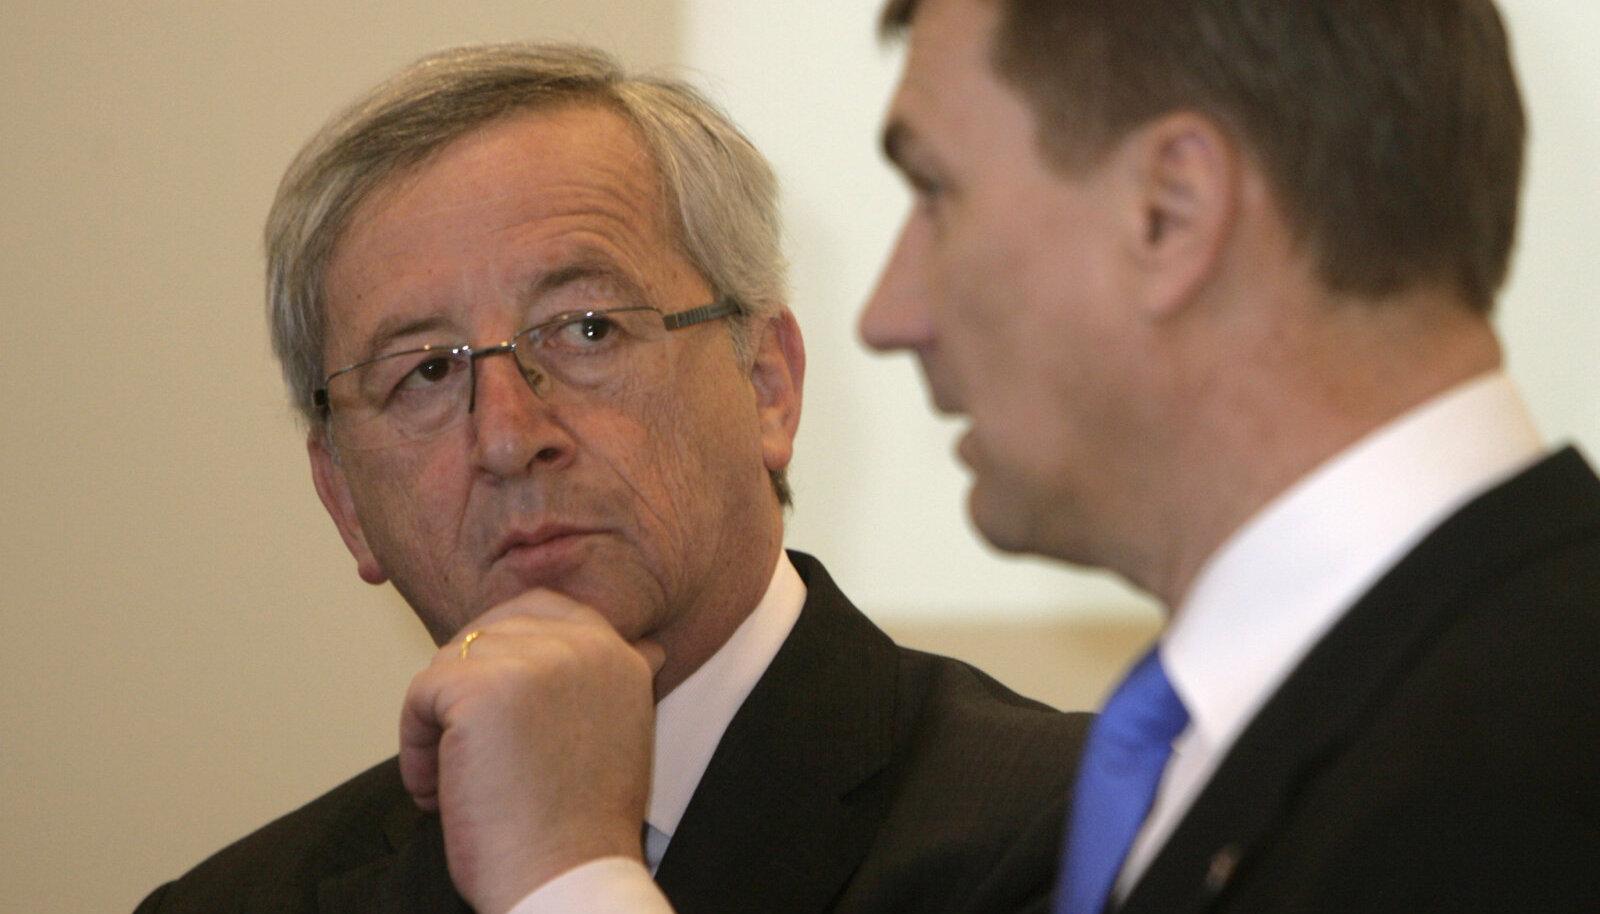 Jean-Claude Juncker ja Andrus Ansip